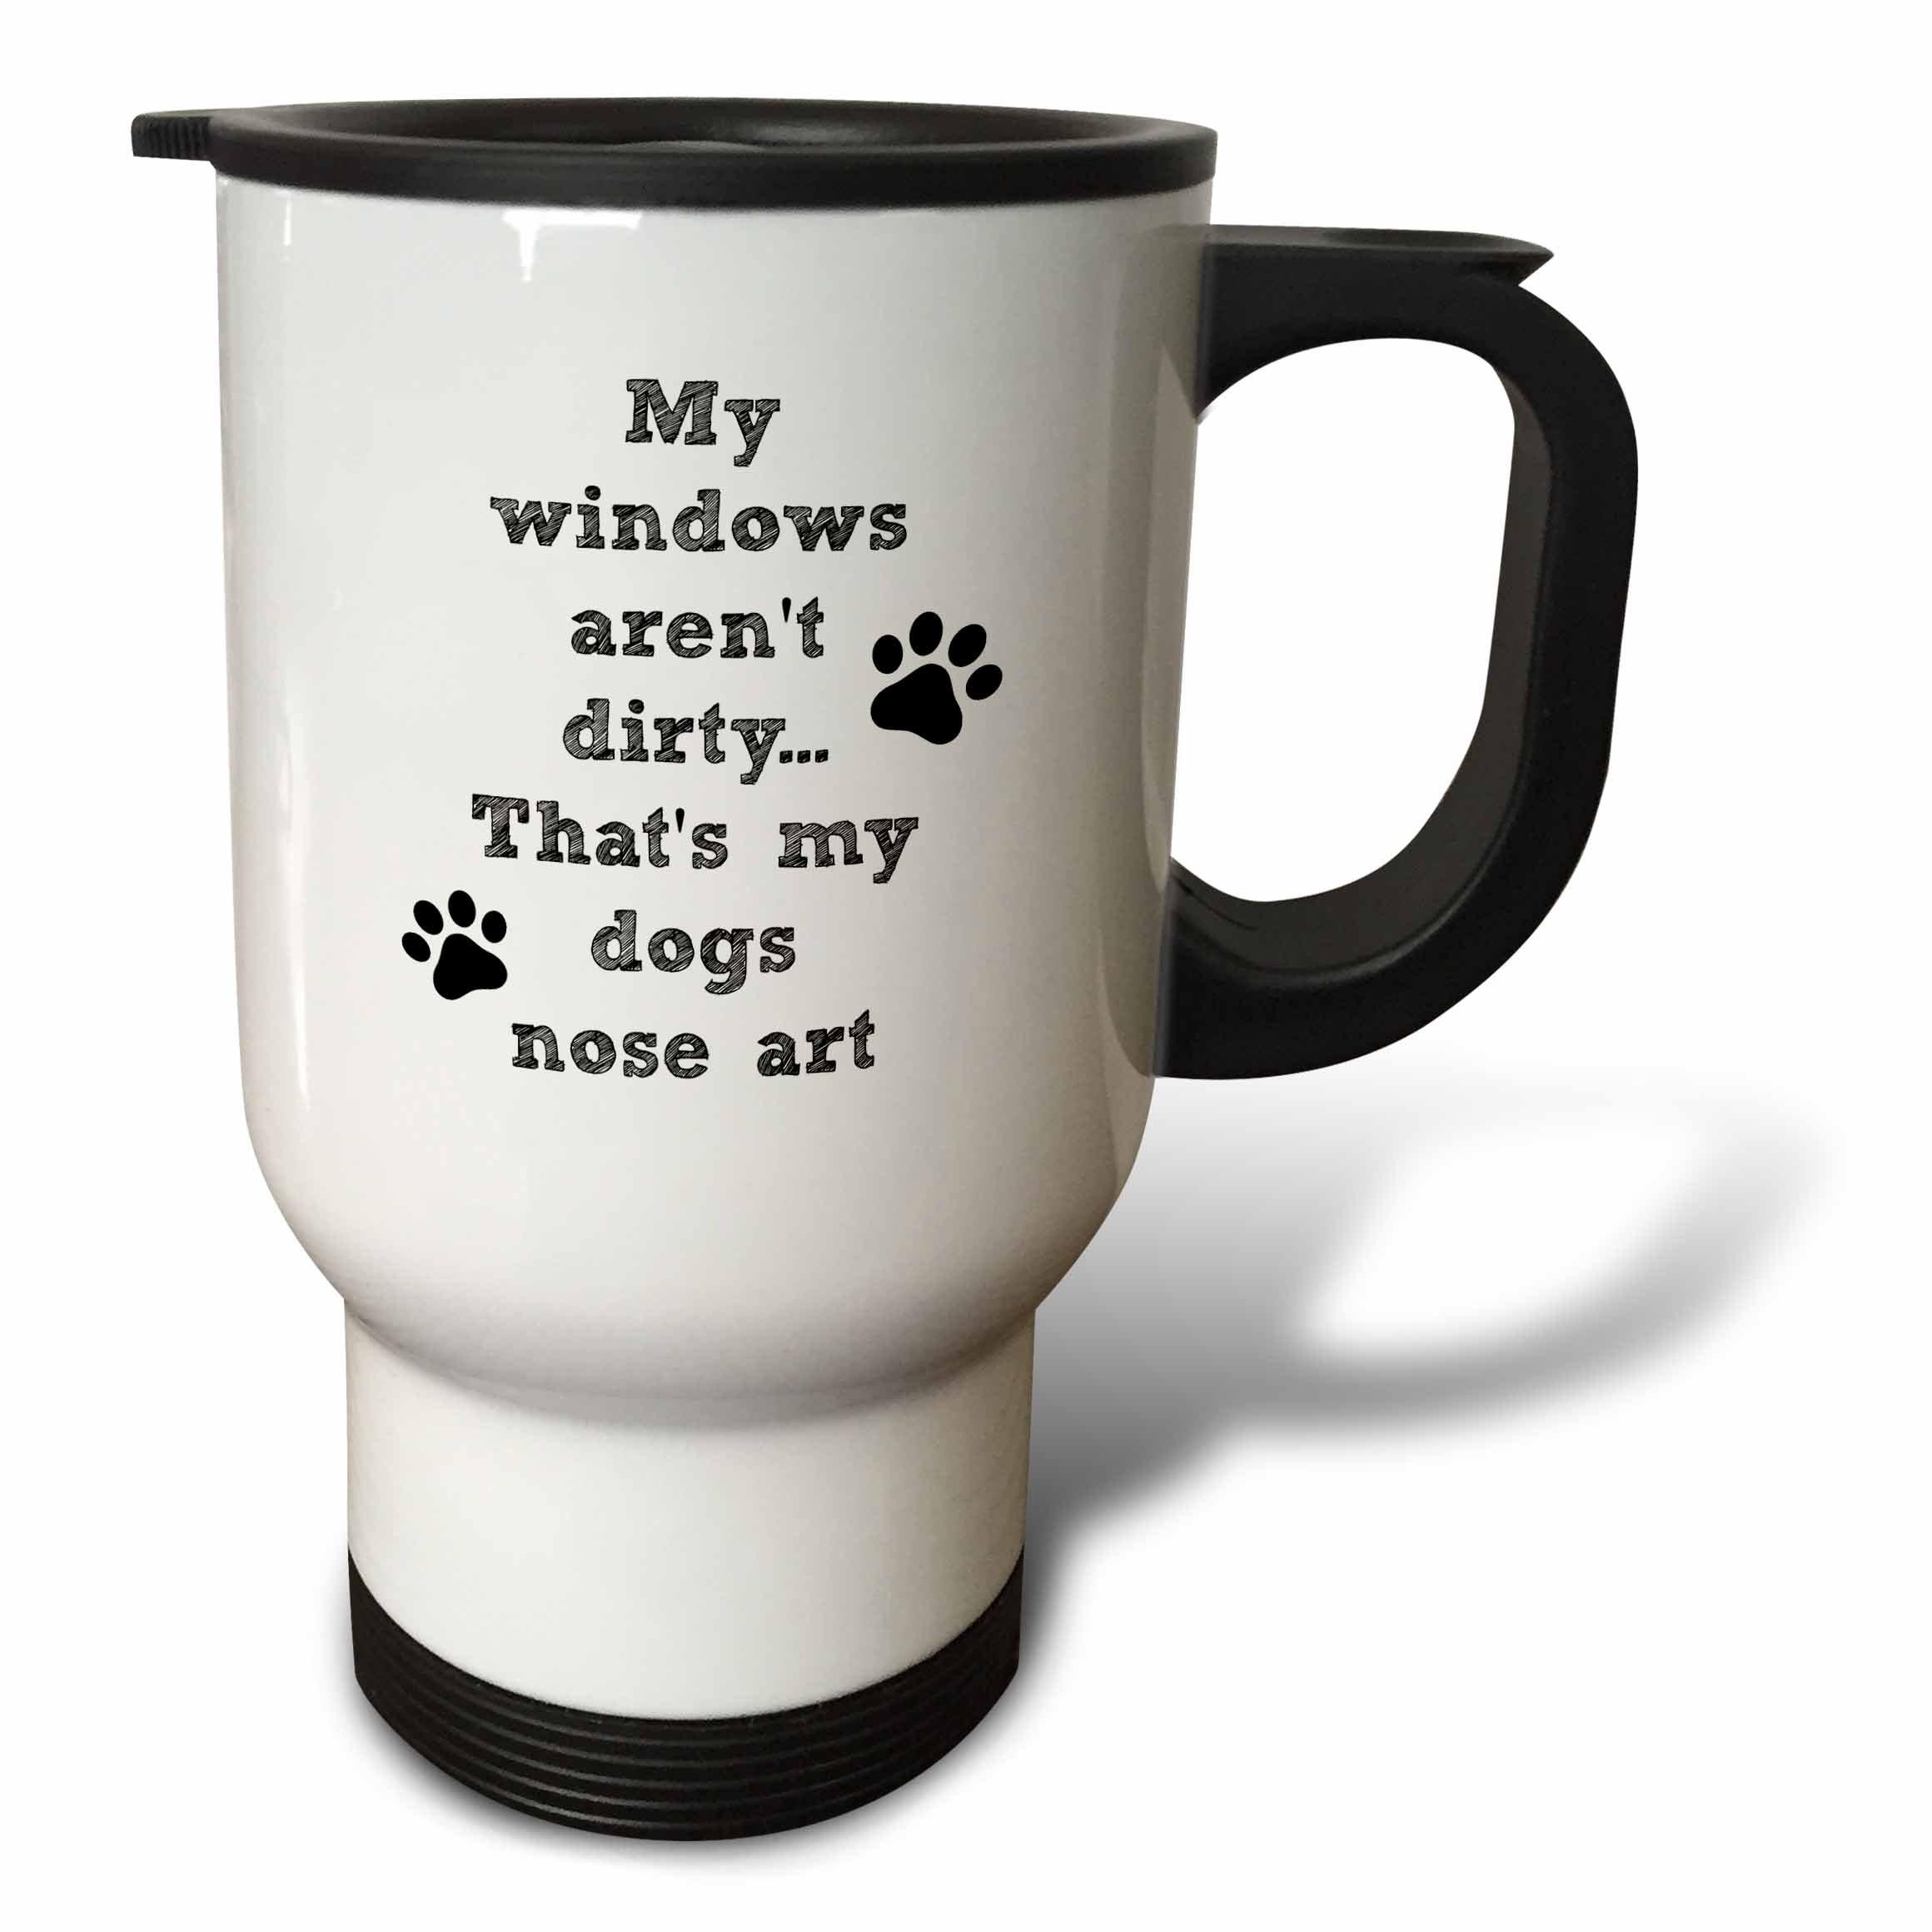 3dRose tm_221817_1 My Windows Aren't Dirty That's My Dogs Nose Art Travel Mug, 14 oz, White